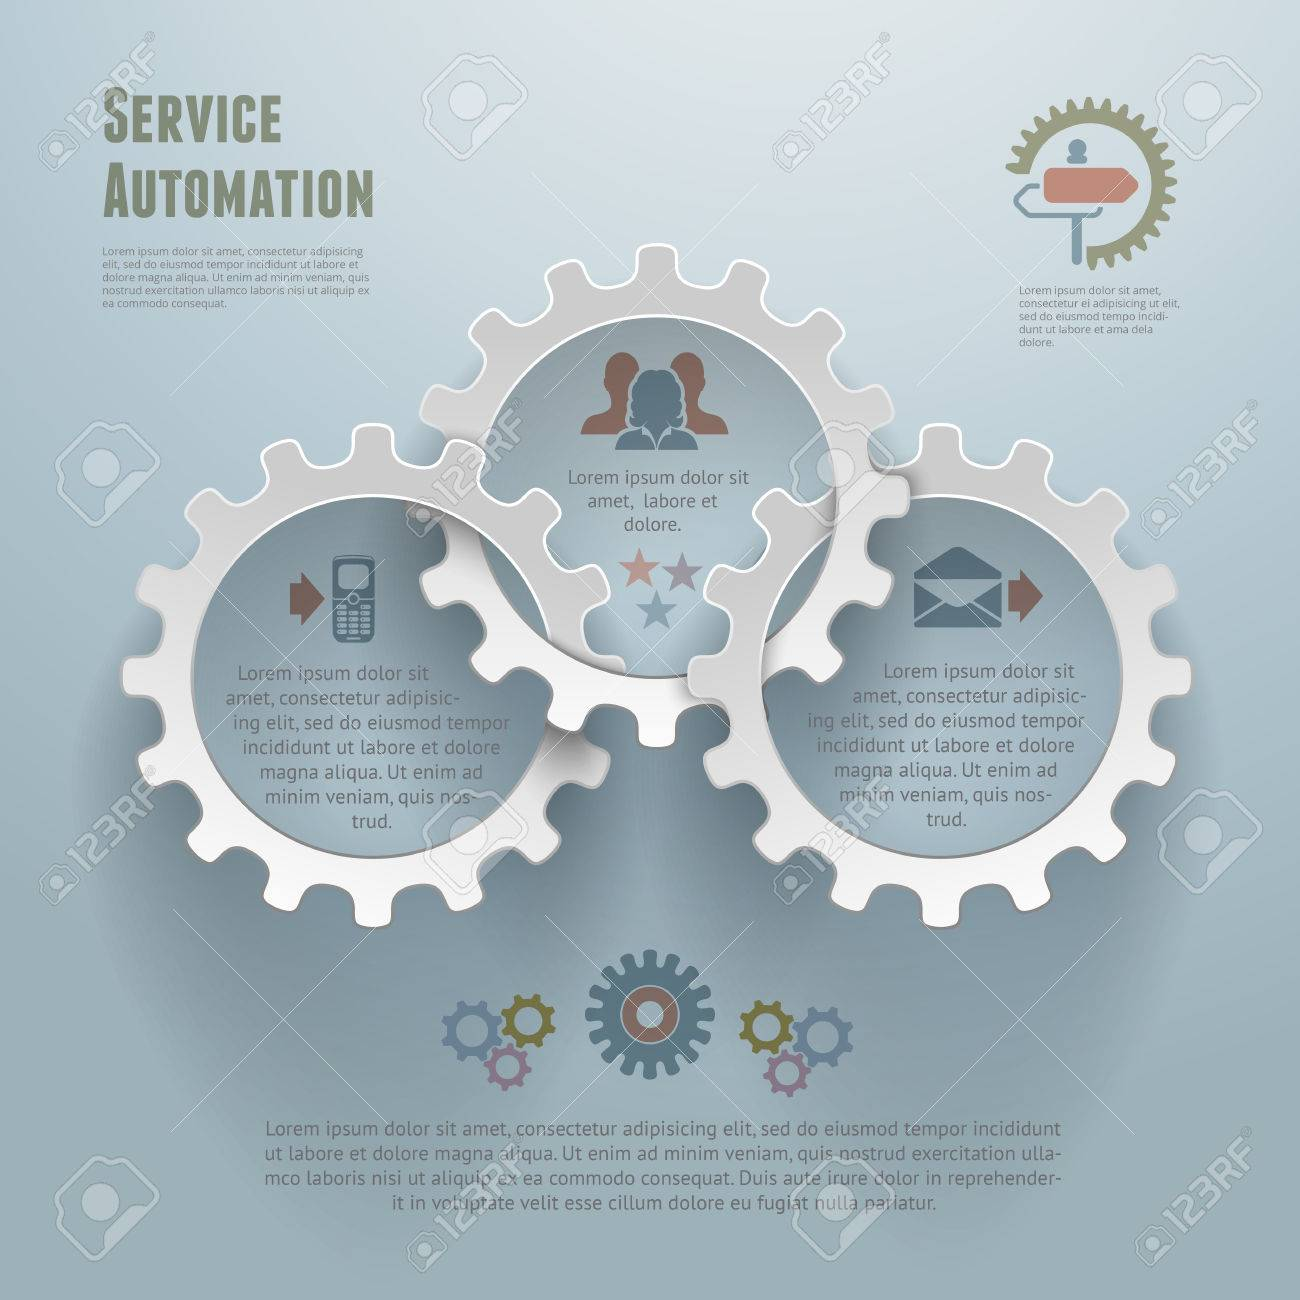 Service Automation Service Automation Concept